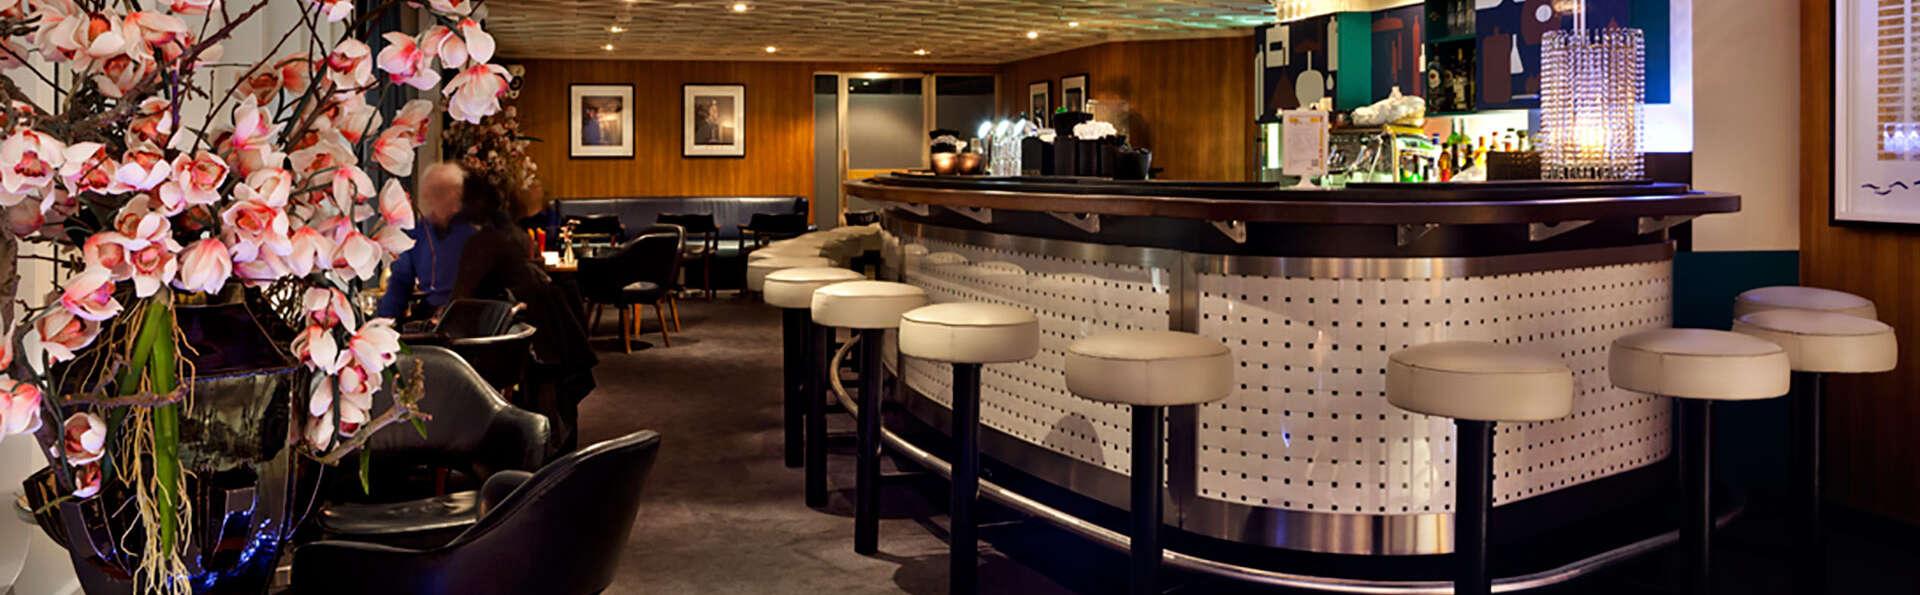 ss Rotterdam Hotel and Restaurants - EDIT_bar1.jpg